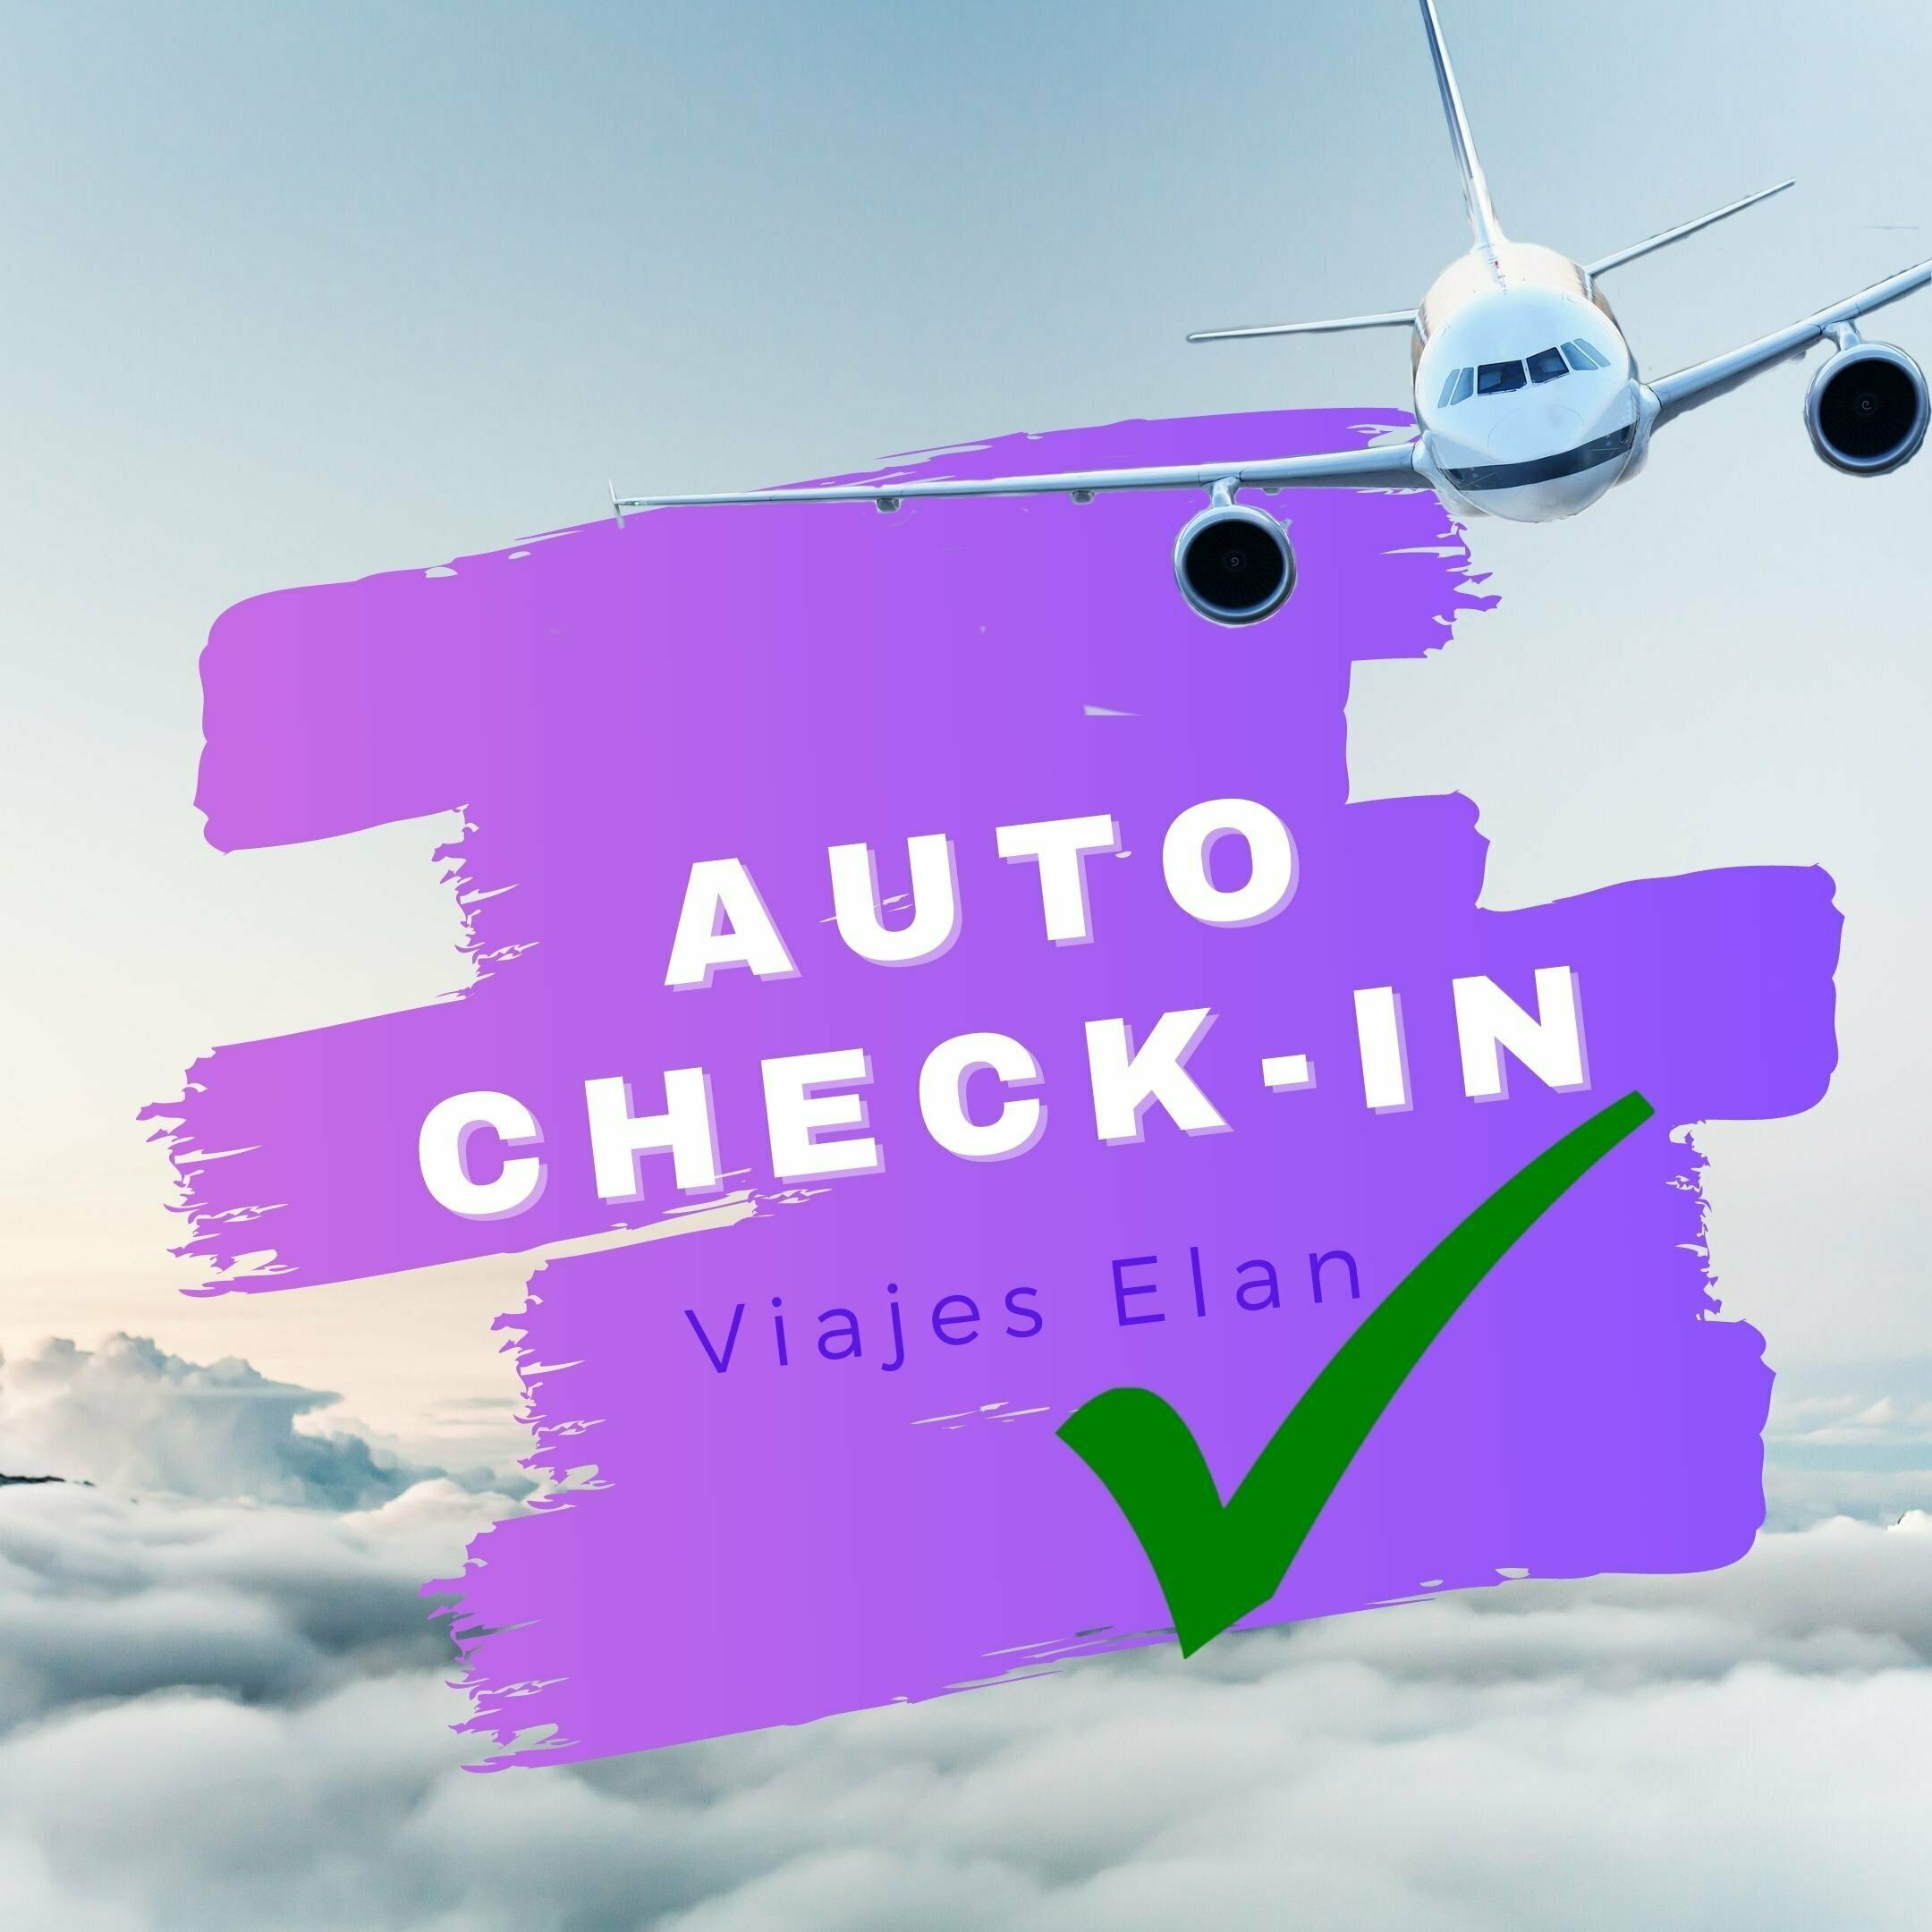 auto-chekin-online-vuelos